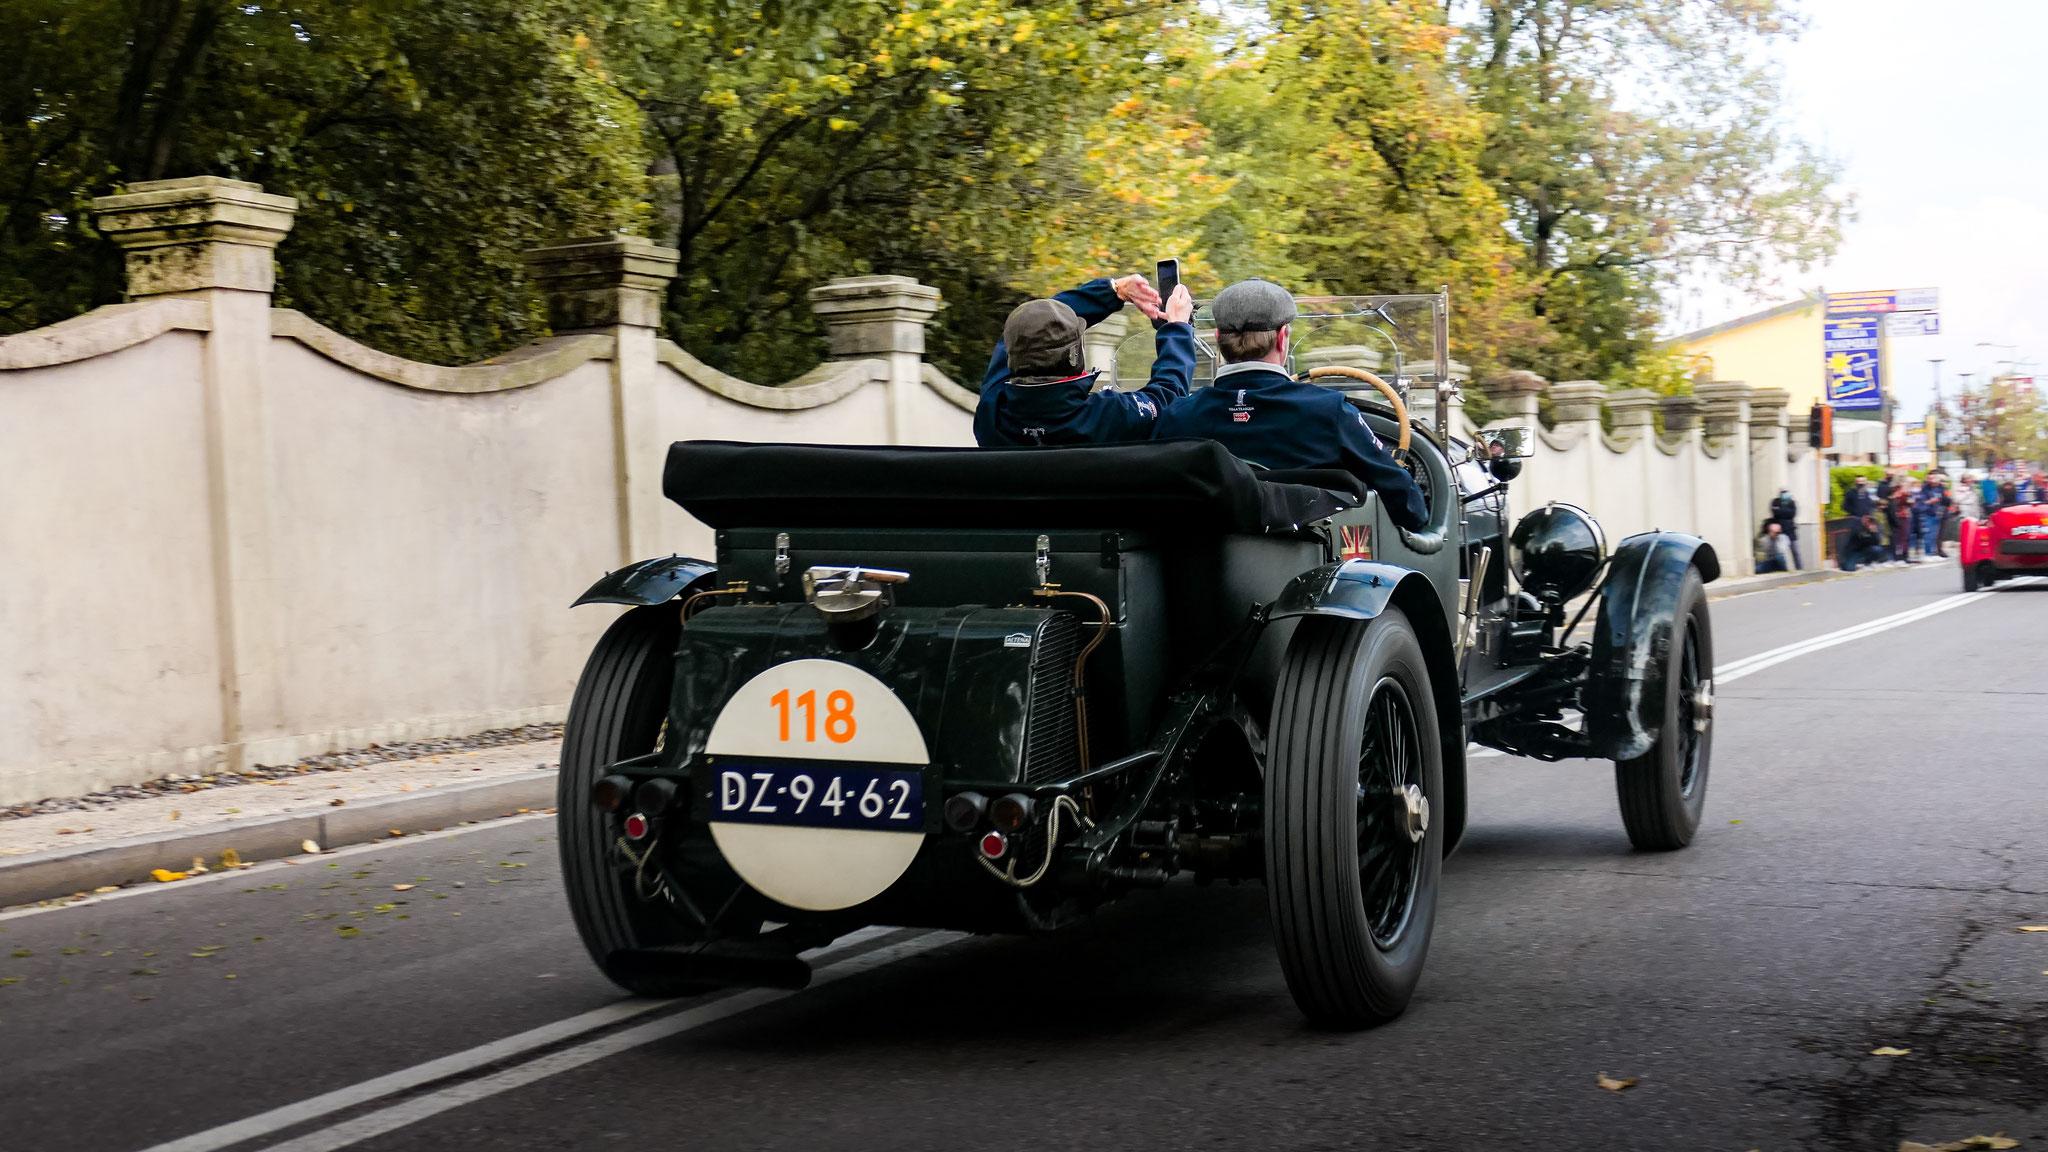 Bentley Speed 8 Le Mans - DZ-94-62 (NED)